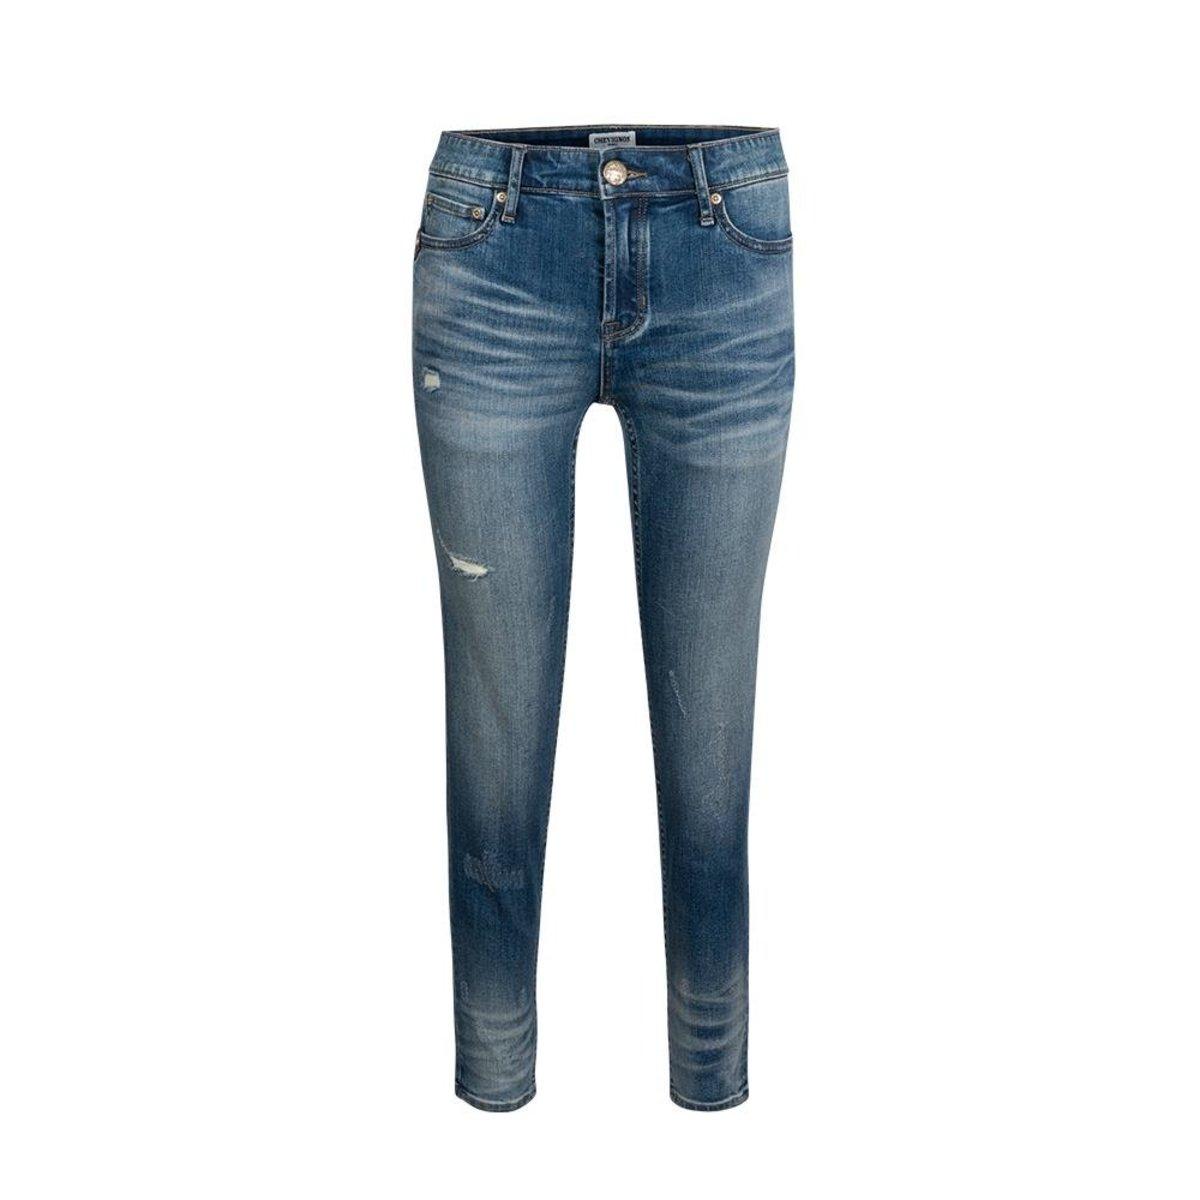 Ladies' Kaihara Slim Taper Mid-waisted Jeans